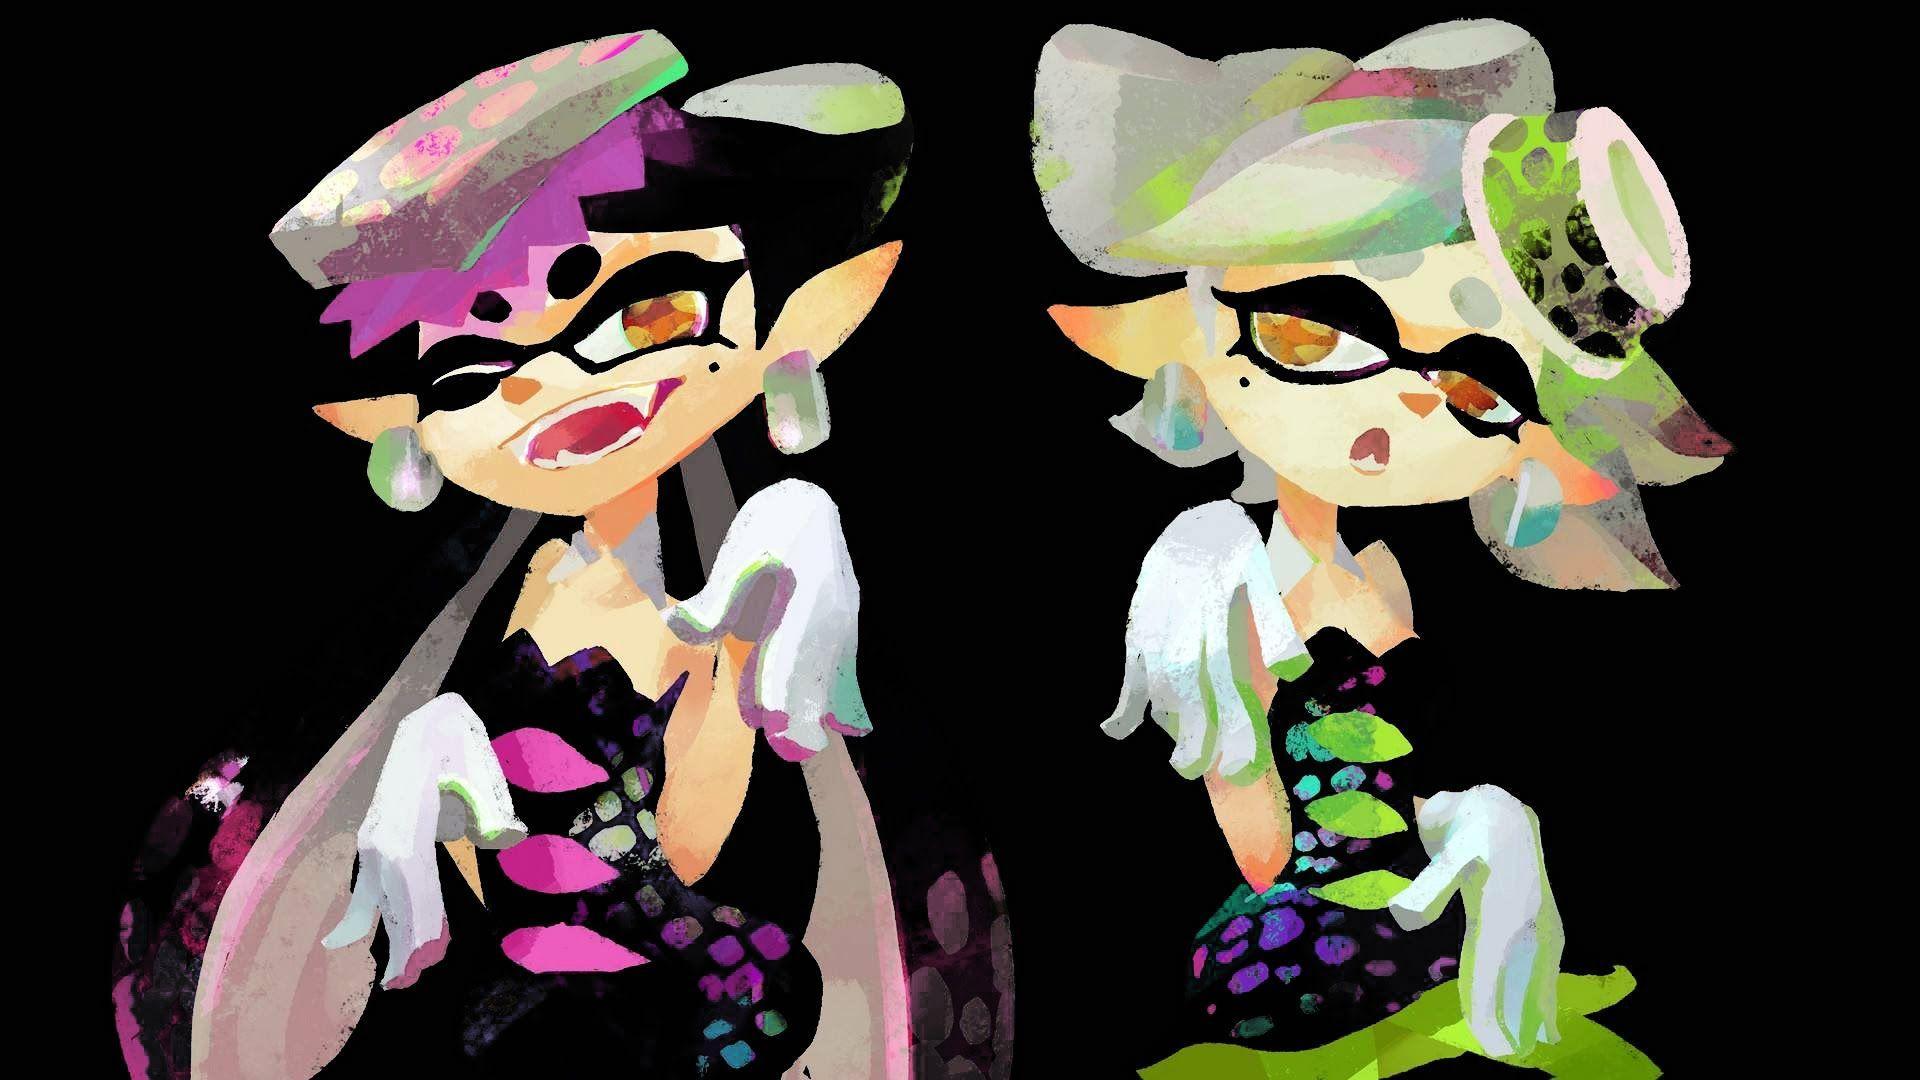 Aioli Splatoon squid sisters wallpapers - wallpaper cave